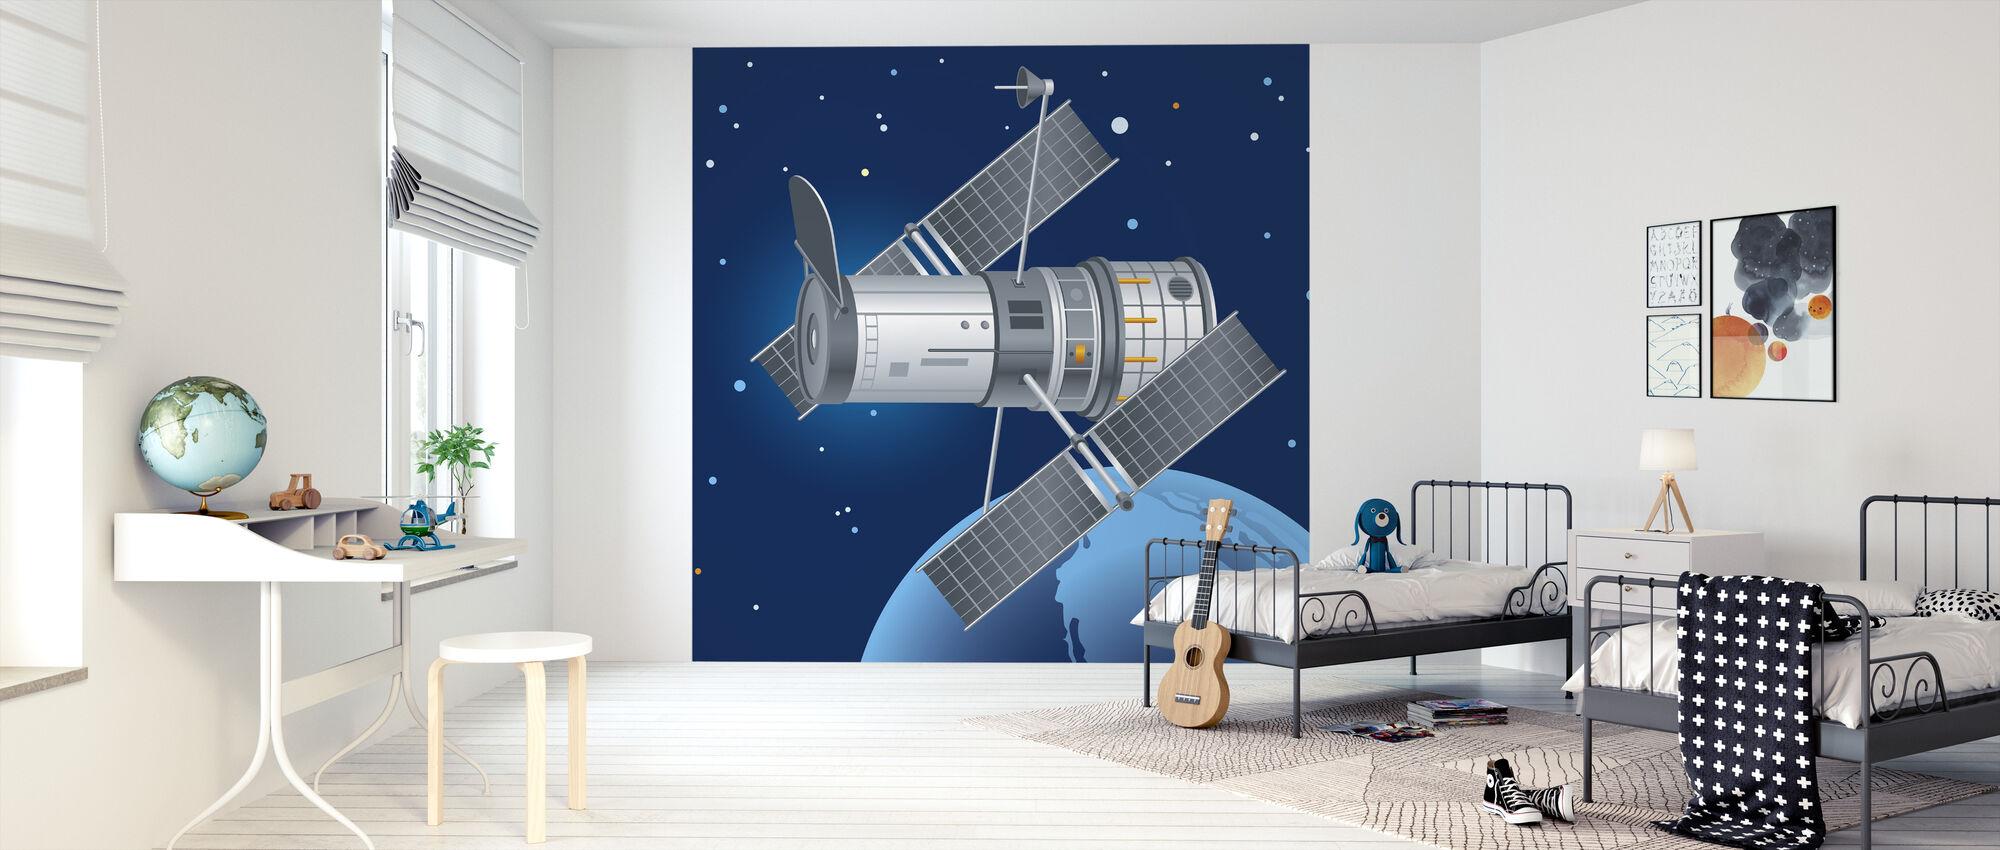 Hubble Telescope - Wallpaper - Kids Room